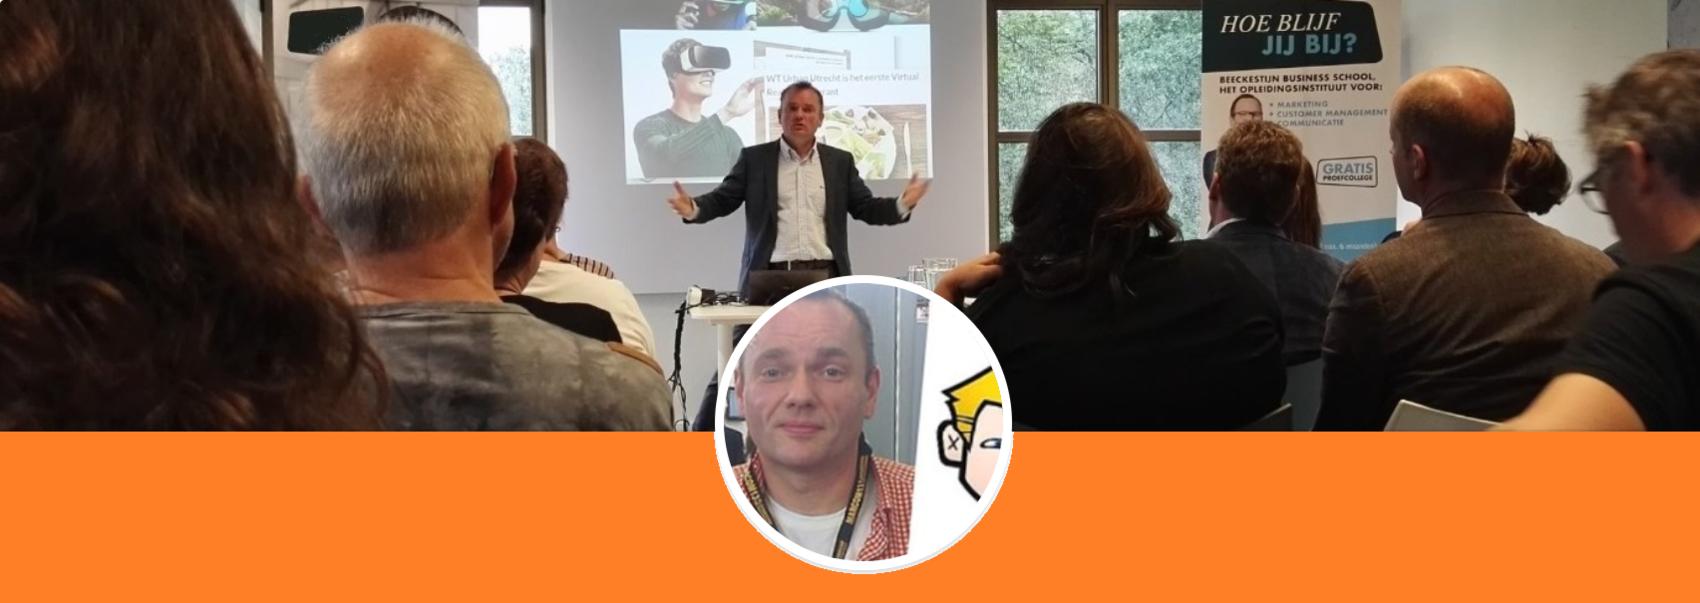 Patrick Petersen spreker ondernemer coach docent